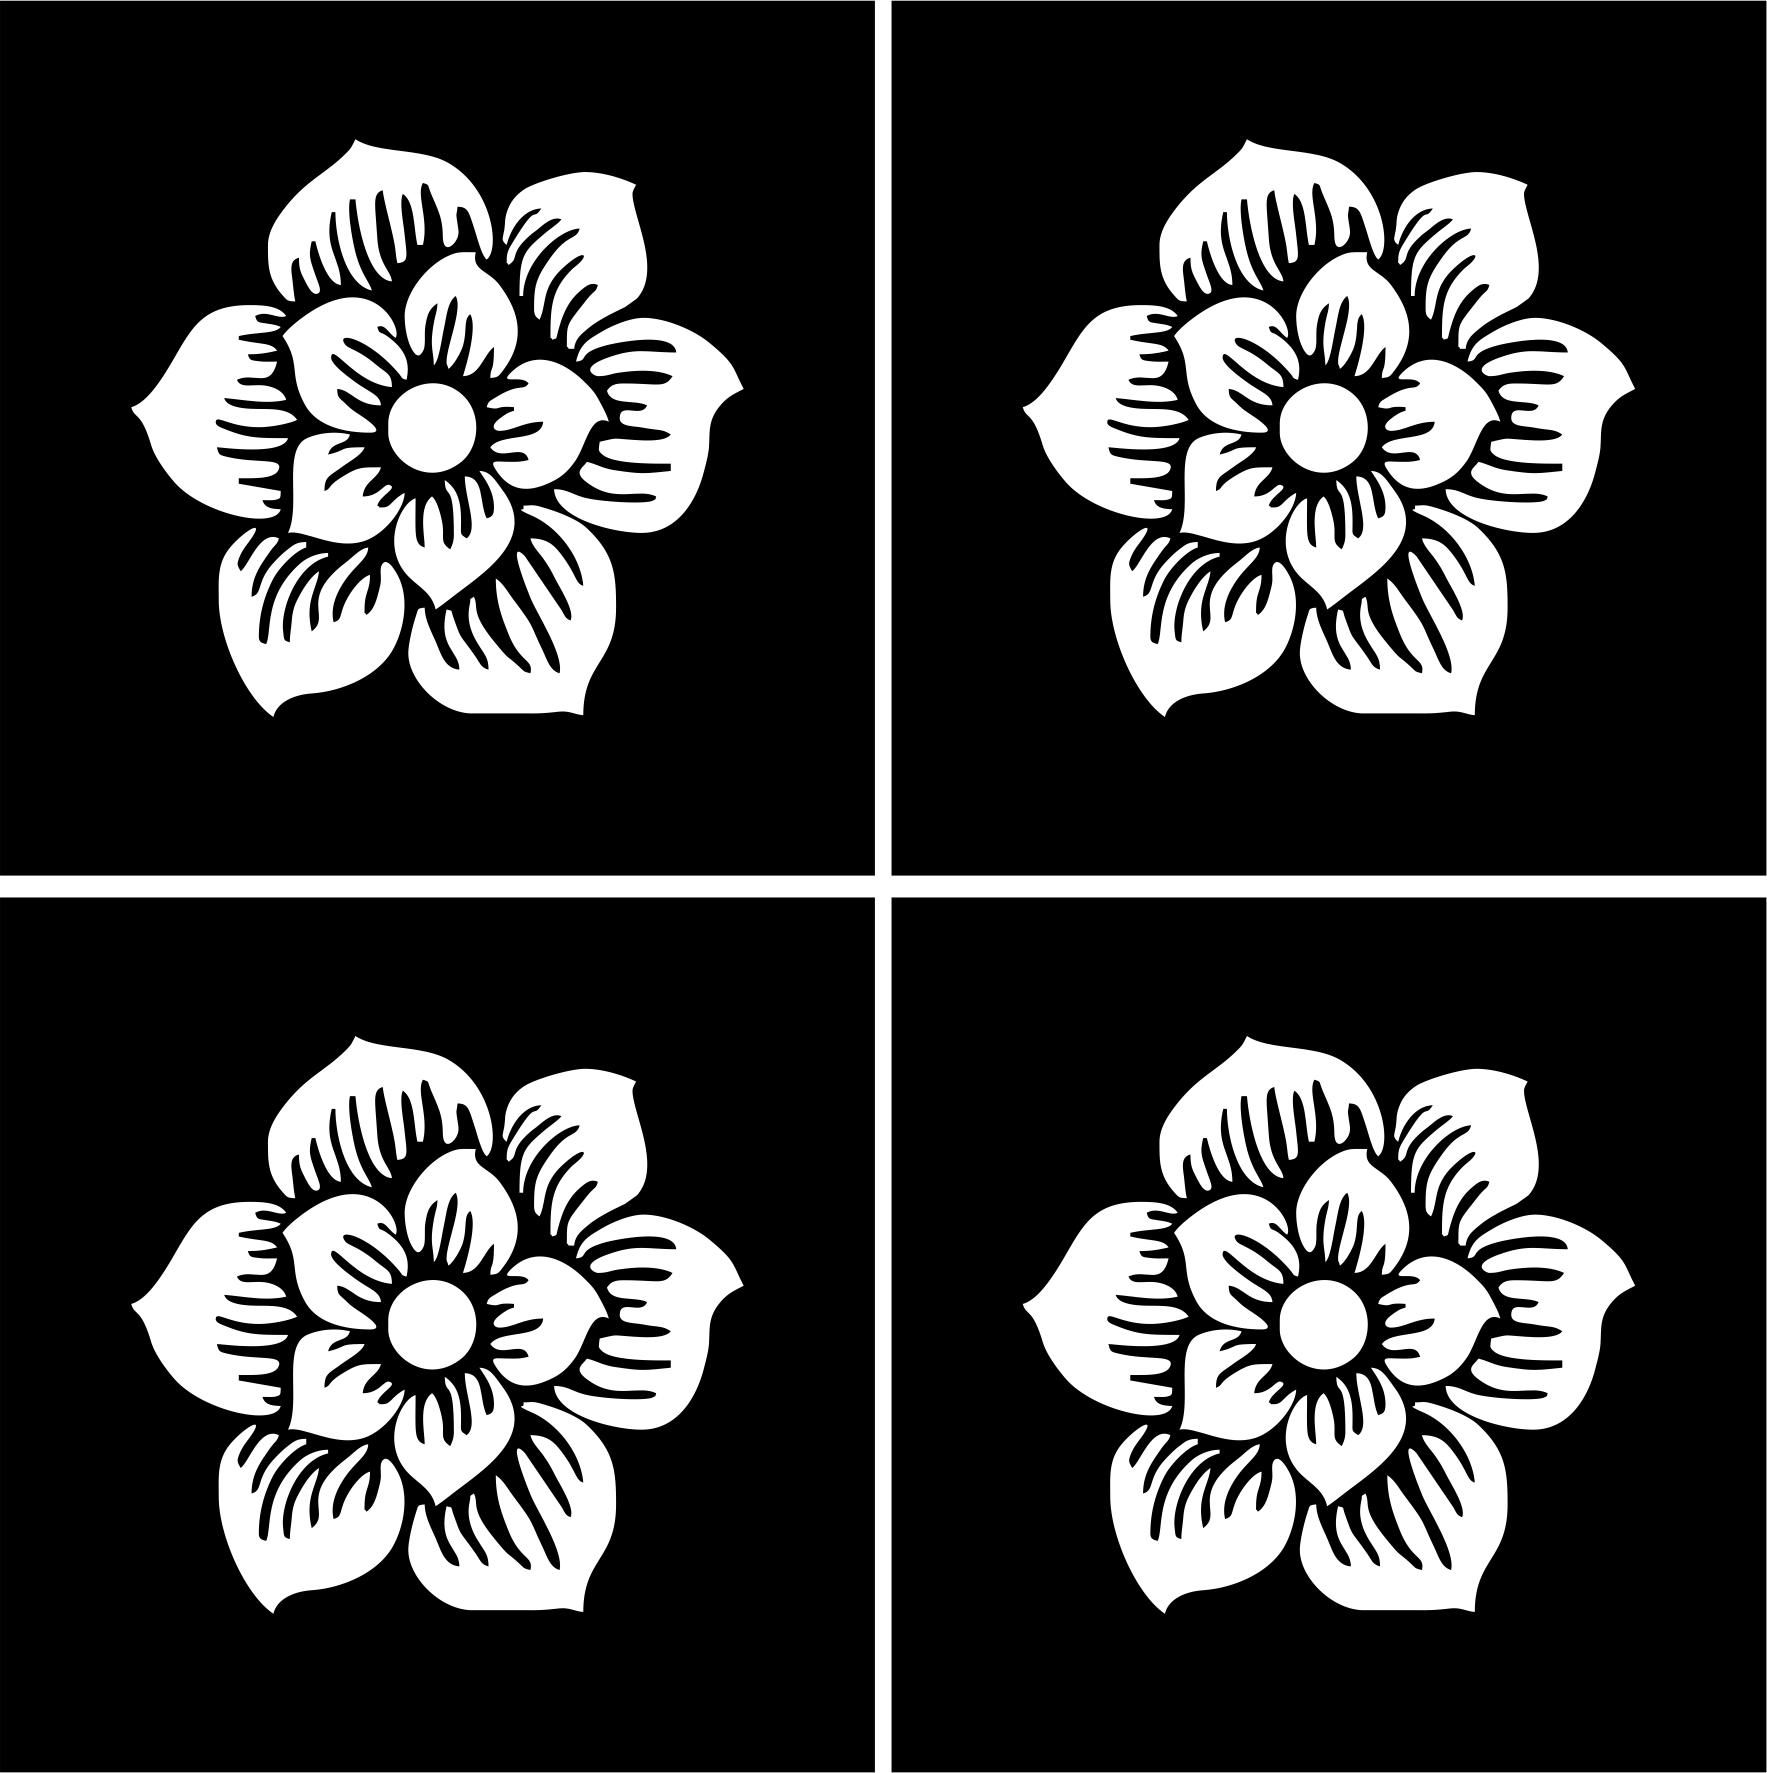 Henna Temporary Tattoo Body Art Sticker Stencil Henna